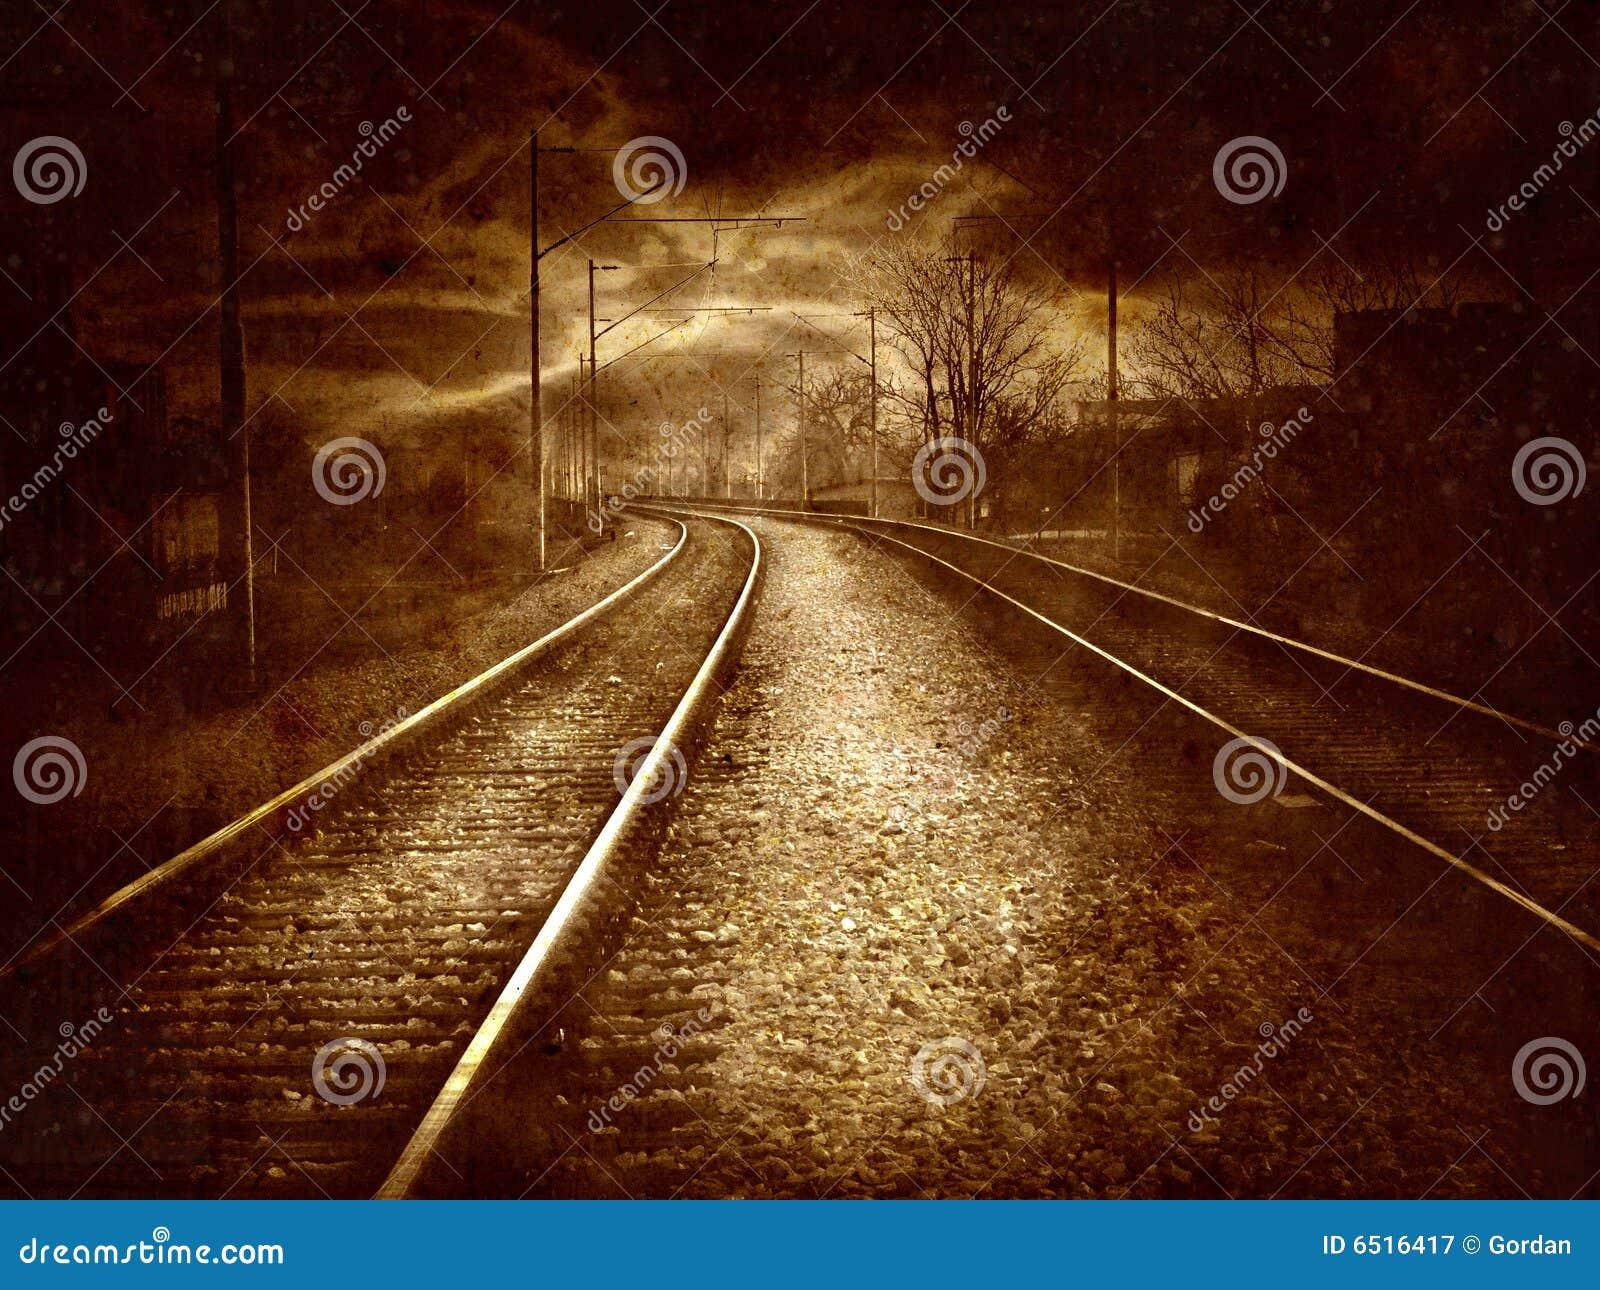 Vintage collage - old railroad